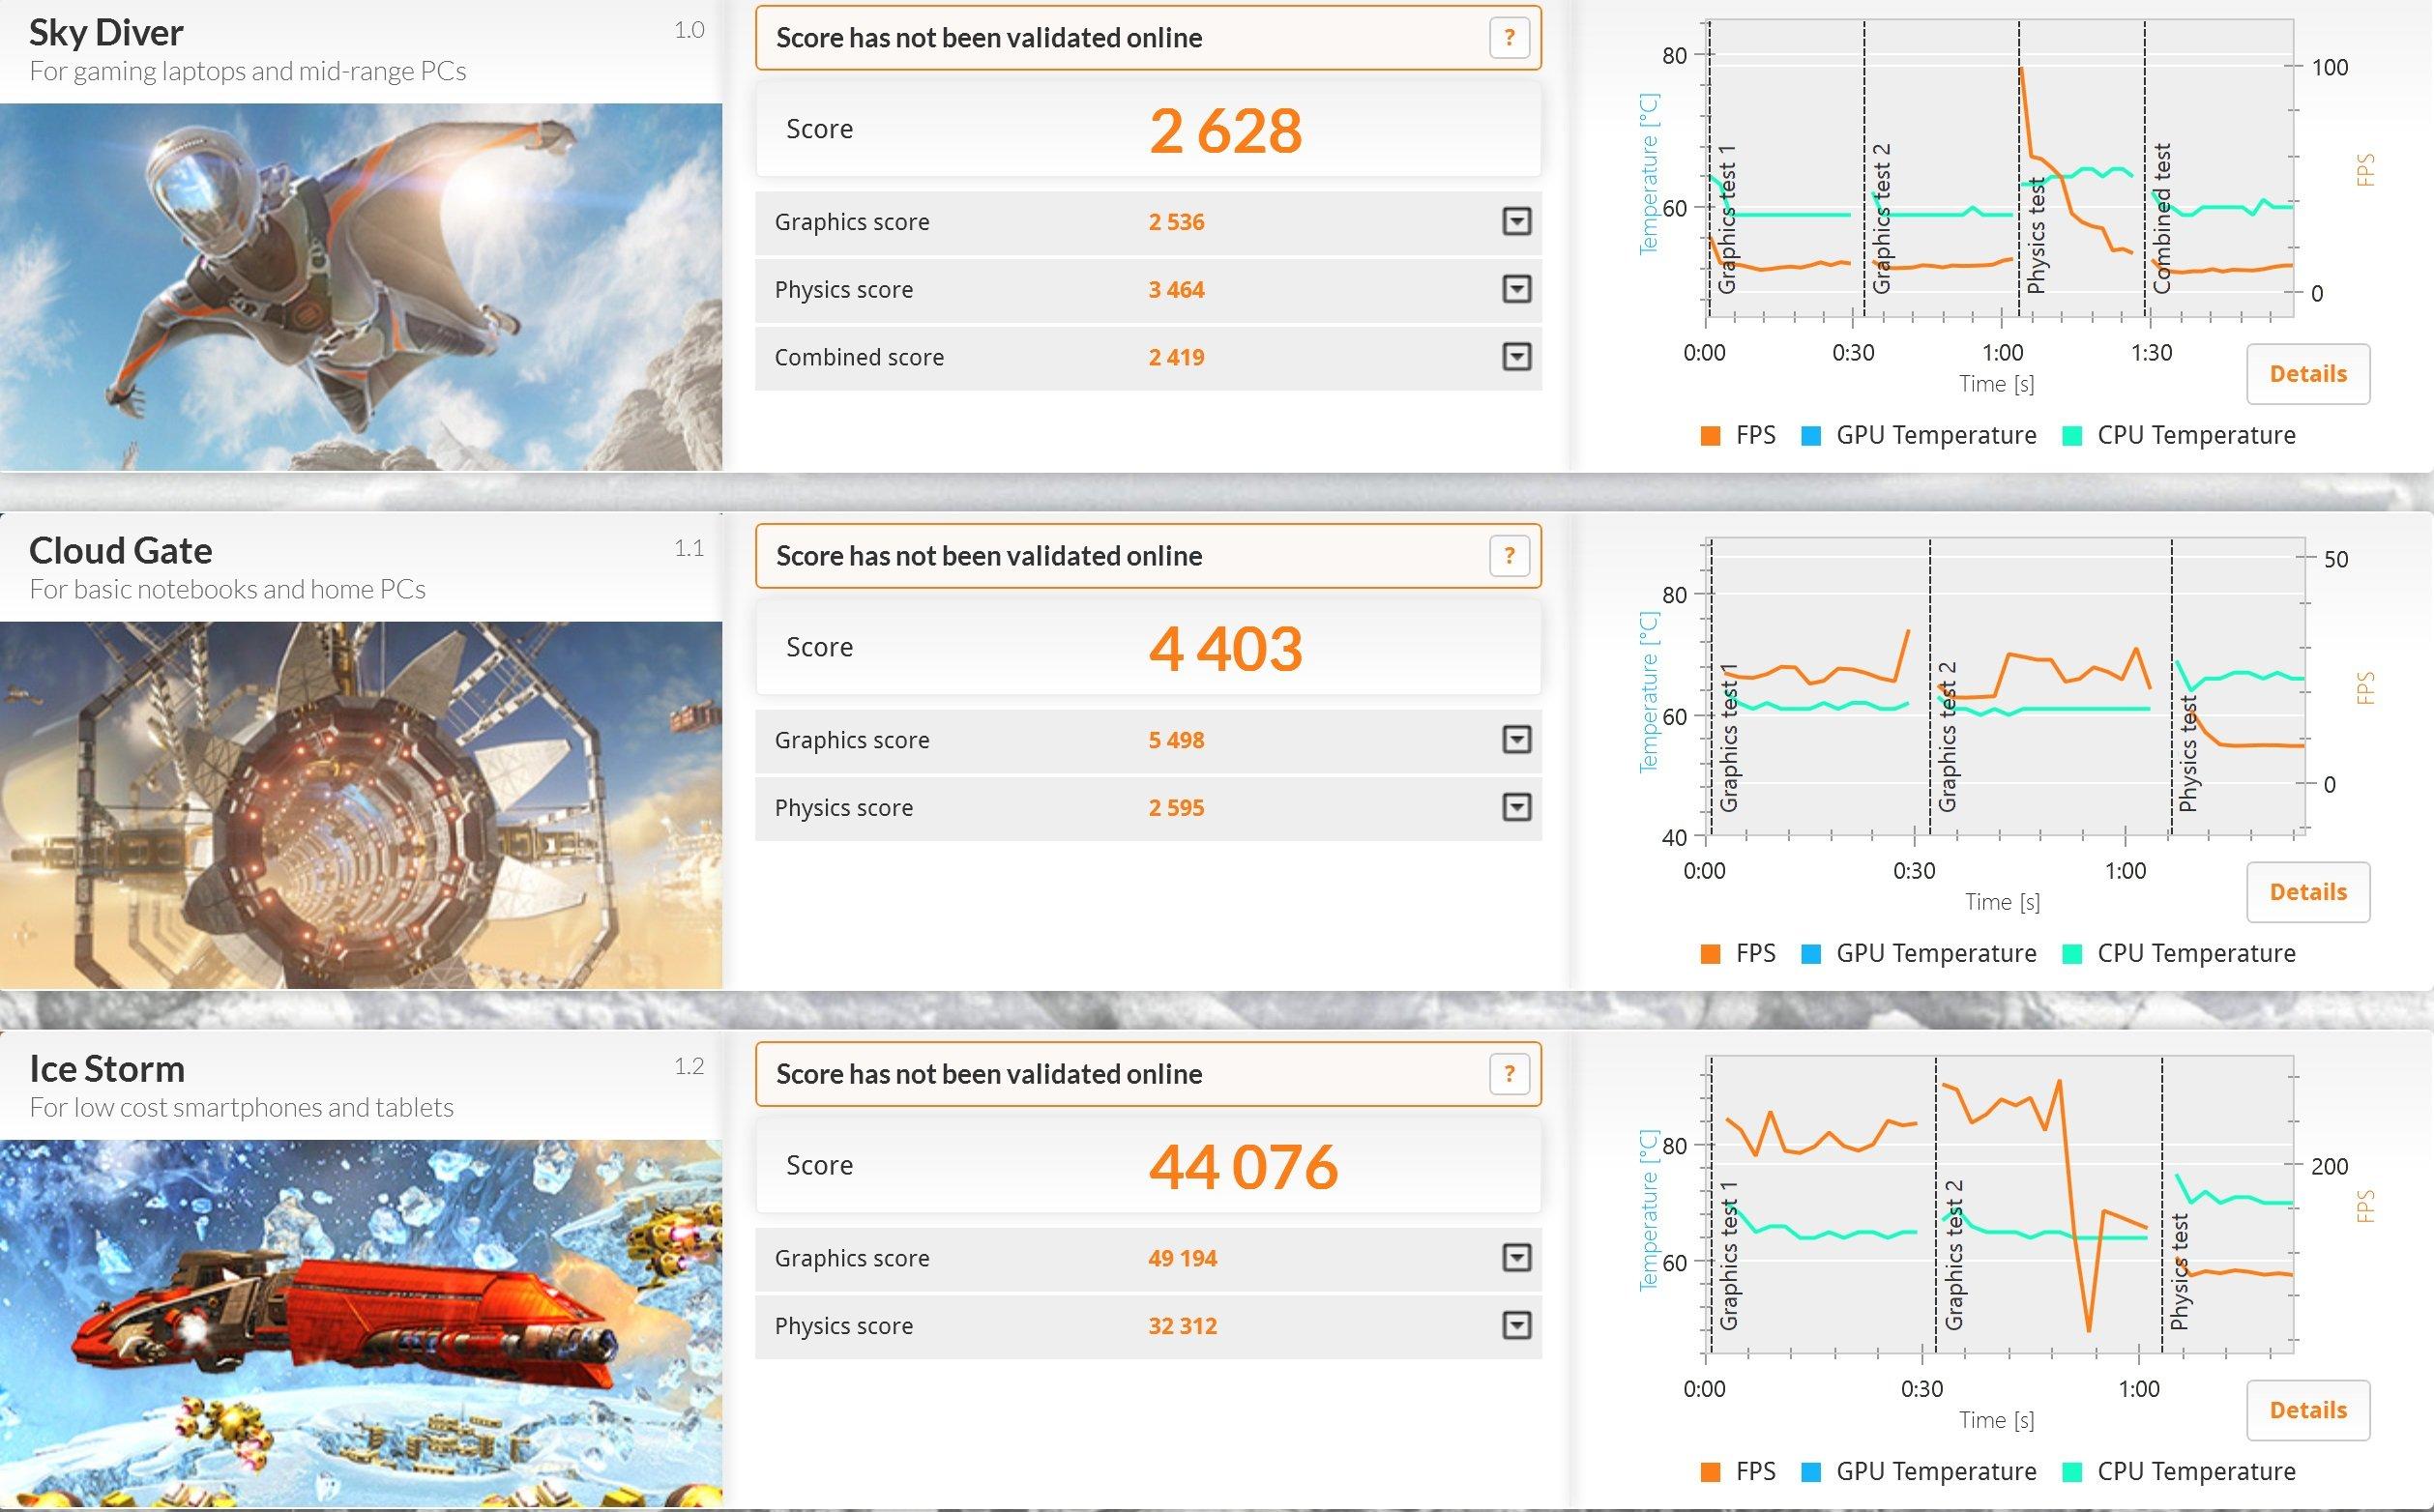 Digiato Review Asus Transformer 3 Pro 3D Mark